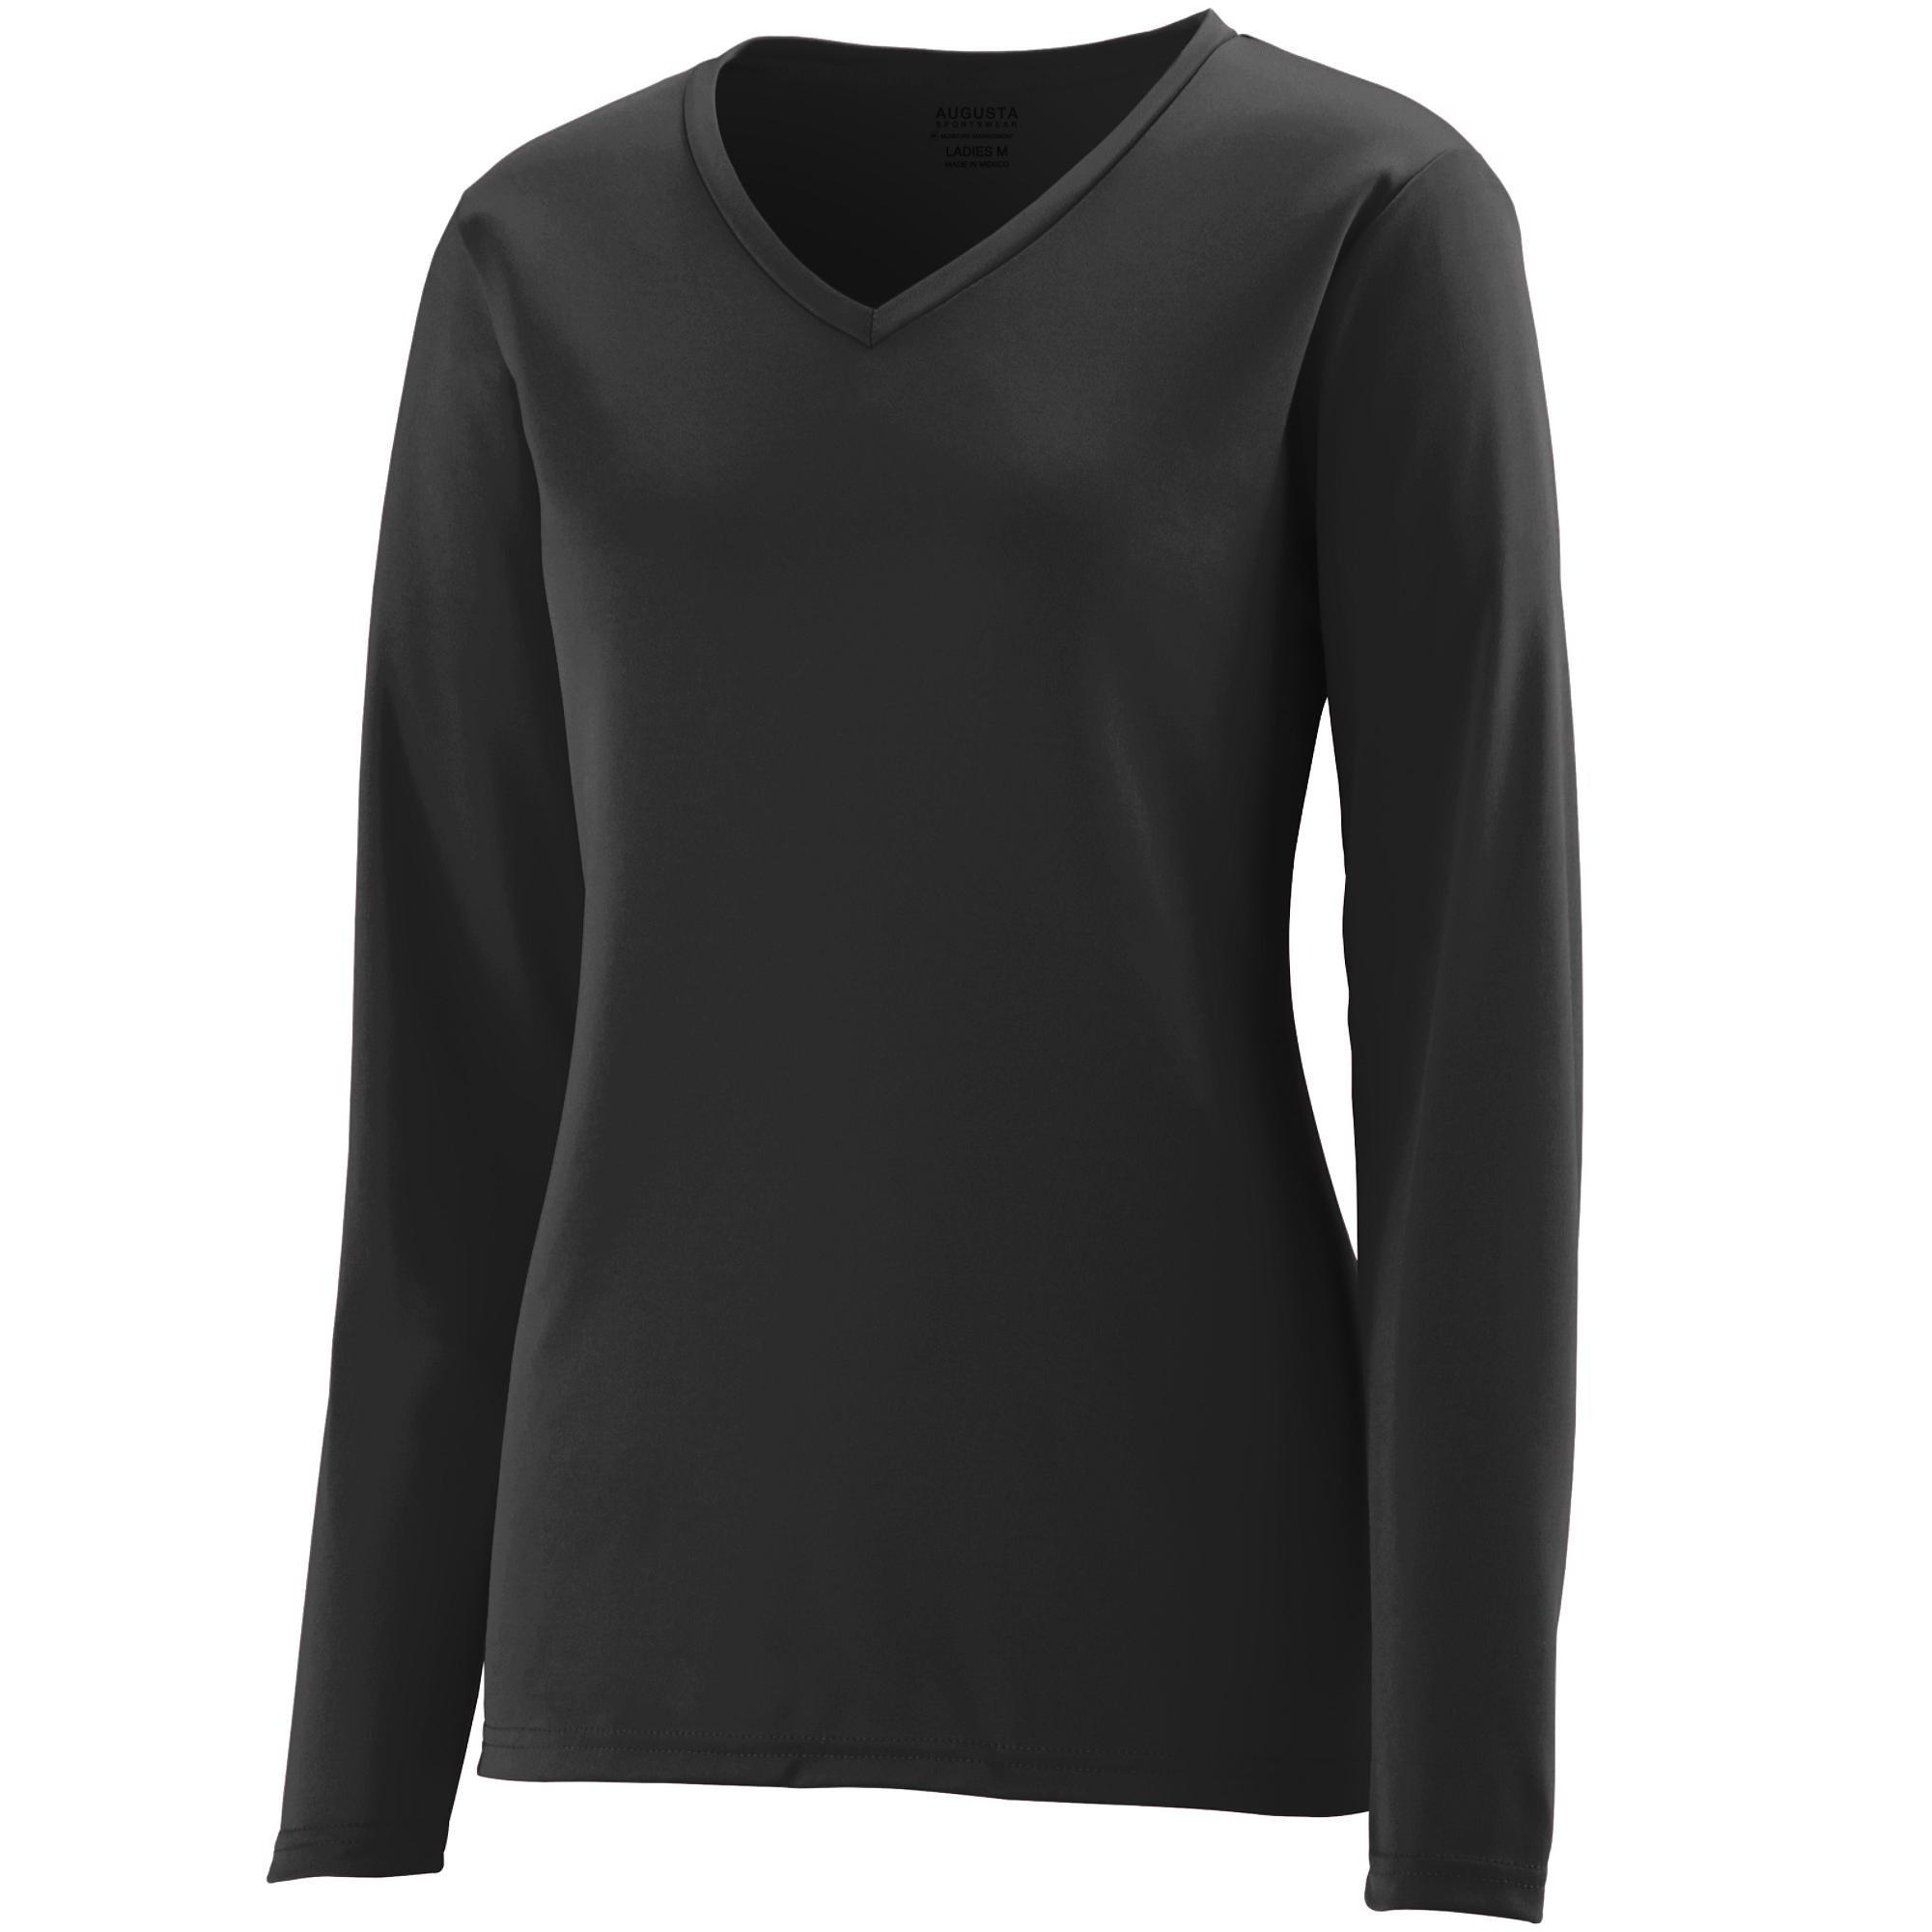 Augusta Sportswear Womens Long Sleeve Wicking T-Shirt, Black, 3X-Large